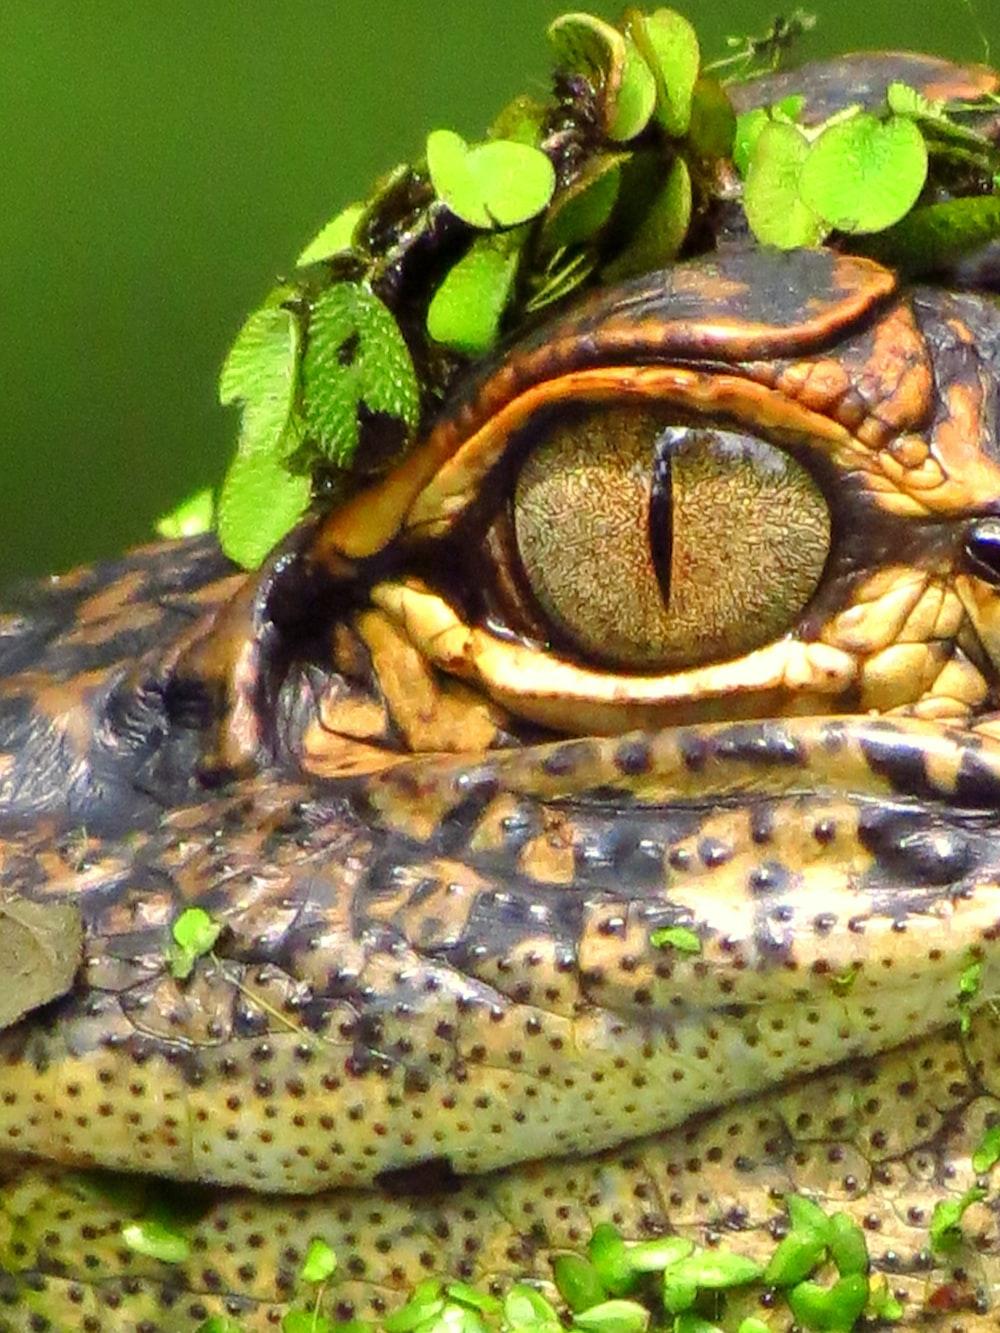 black and brown crocodile on green grass